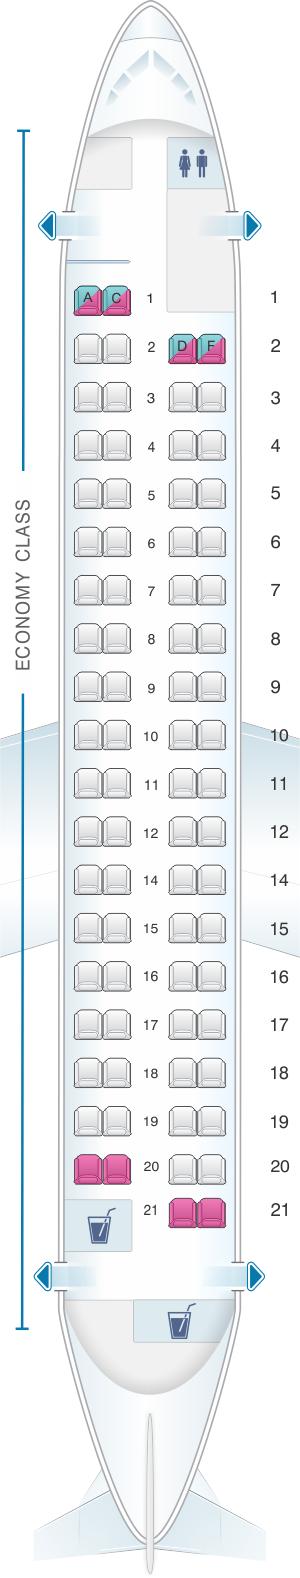 Seat map for Croatia Airlines Dash8 Q400